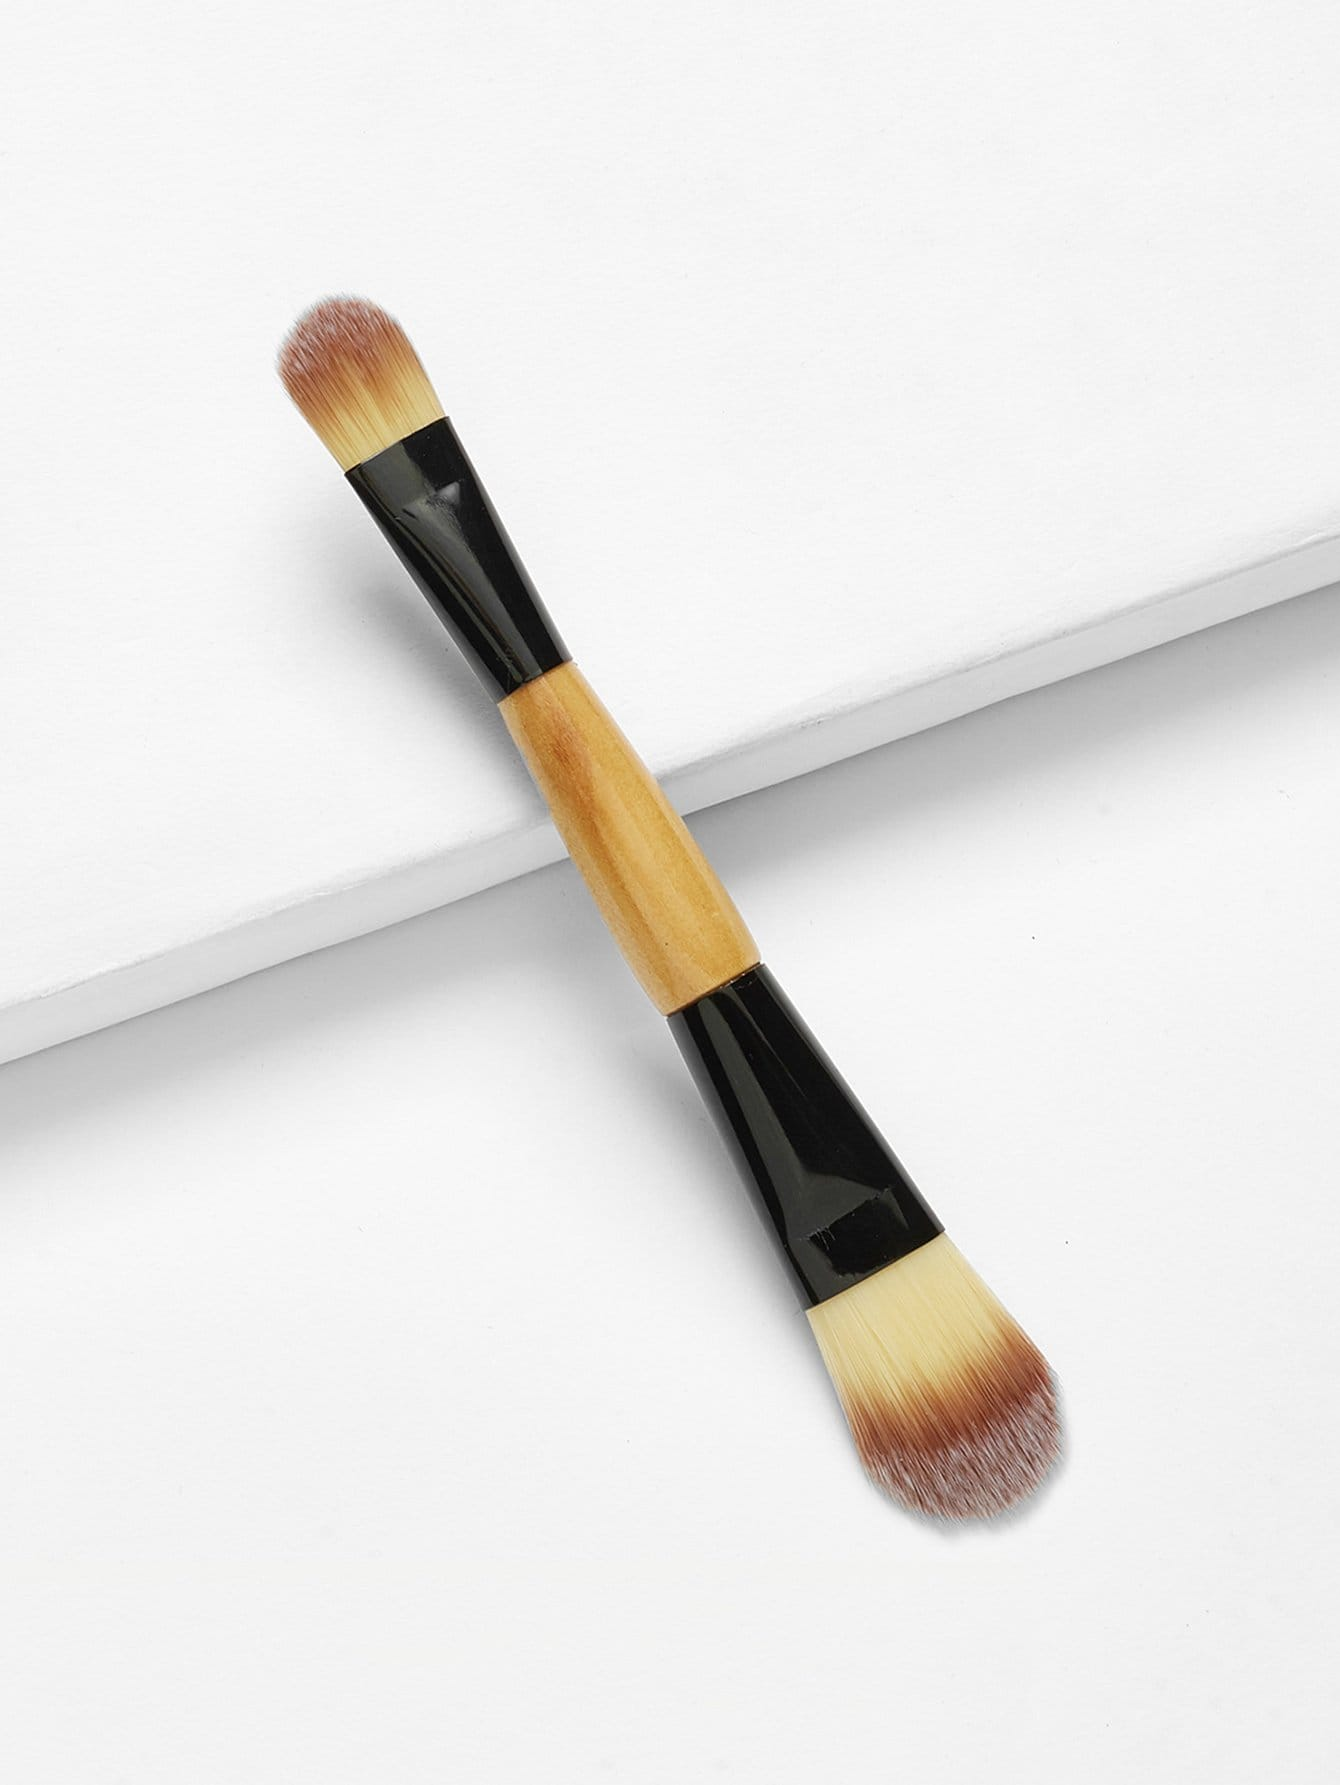 Two Head Professional Makeup Brush 1Pc professional makeup brush 1pc